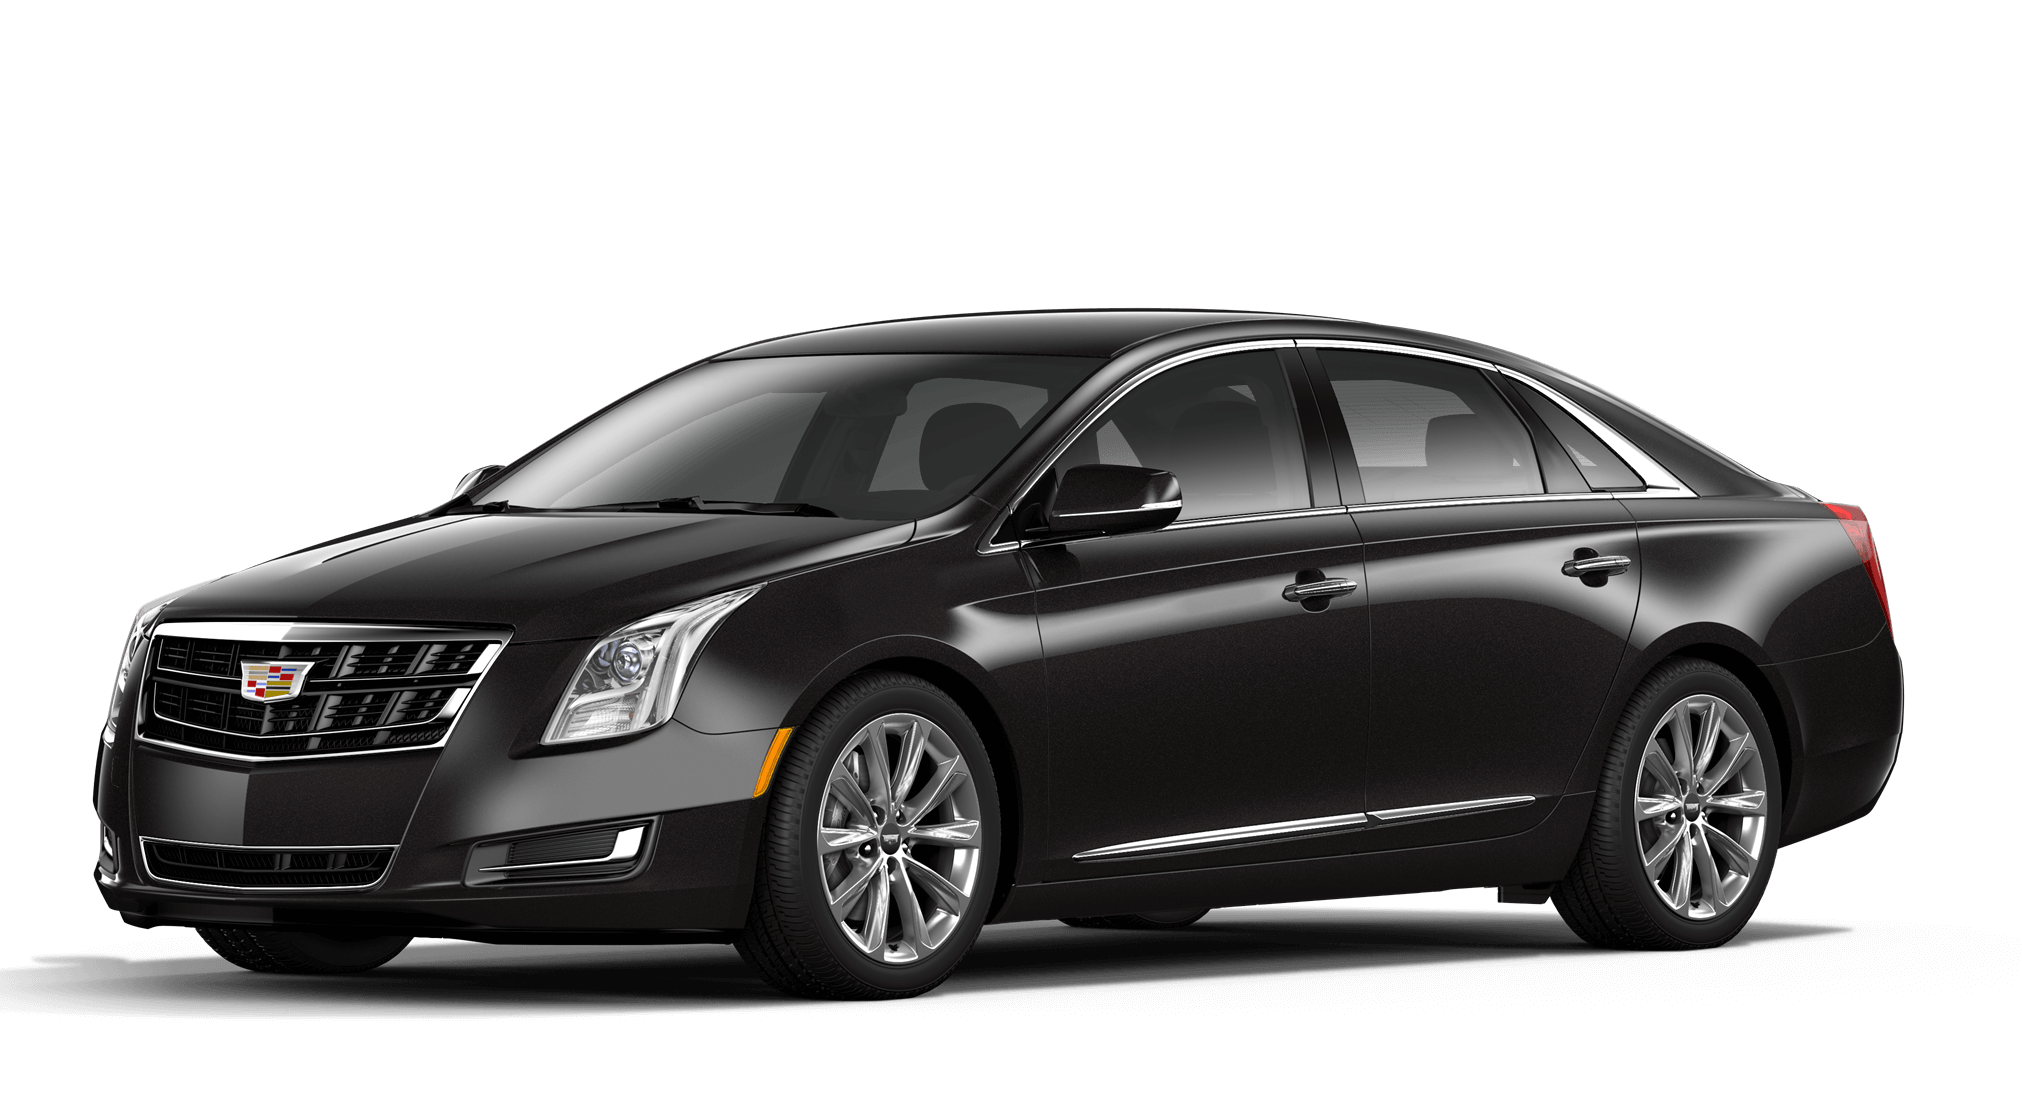 2016 Cadillac XTS Stellar Black Metallic